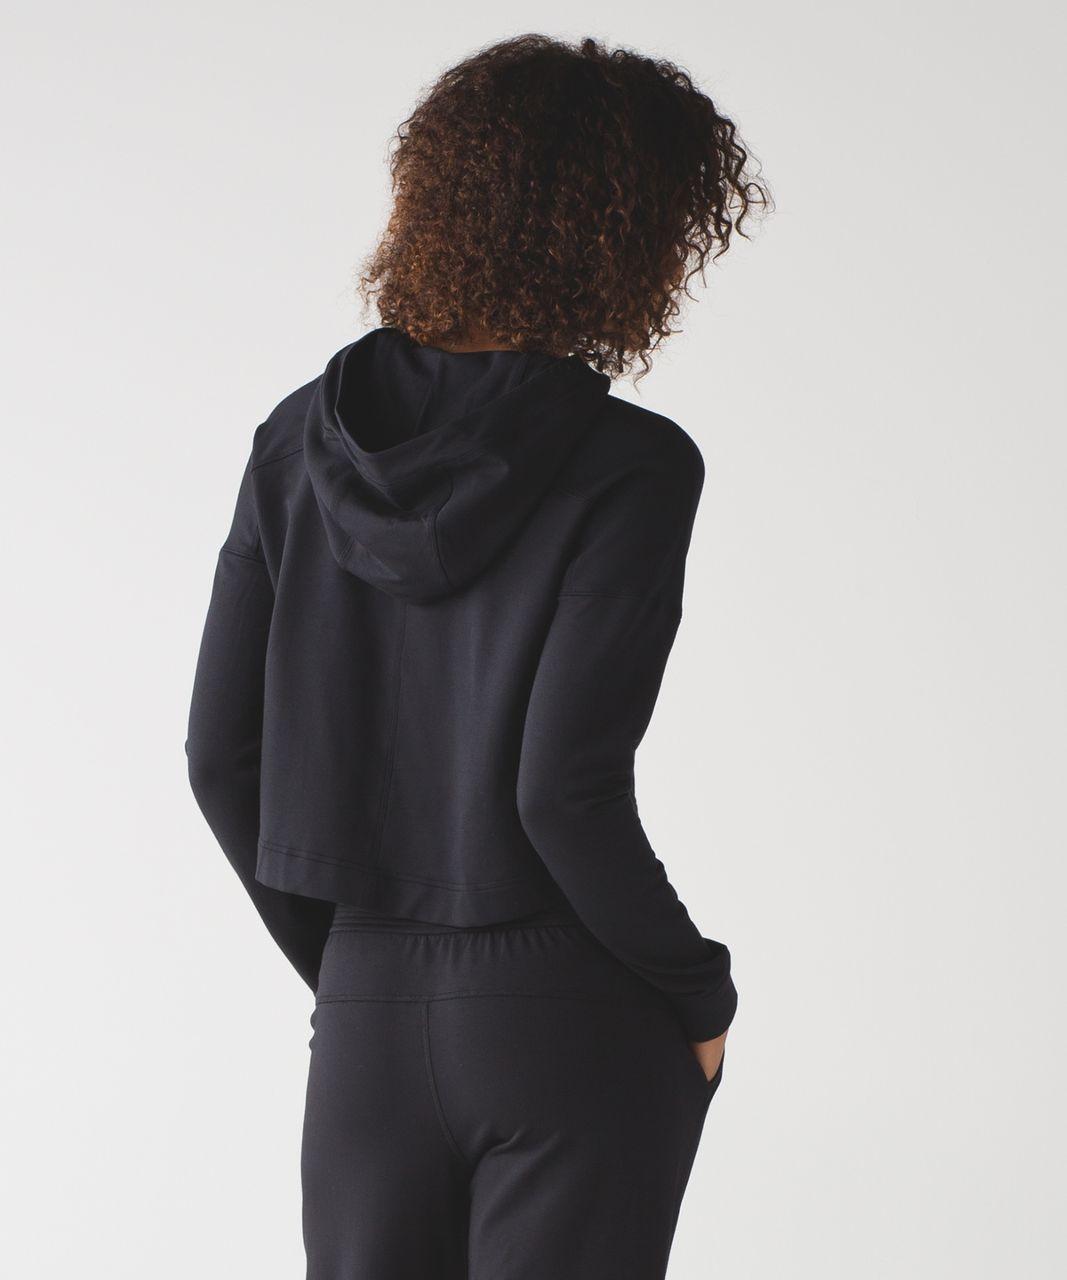 Lululemon Ceremony Pullover - Black